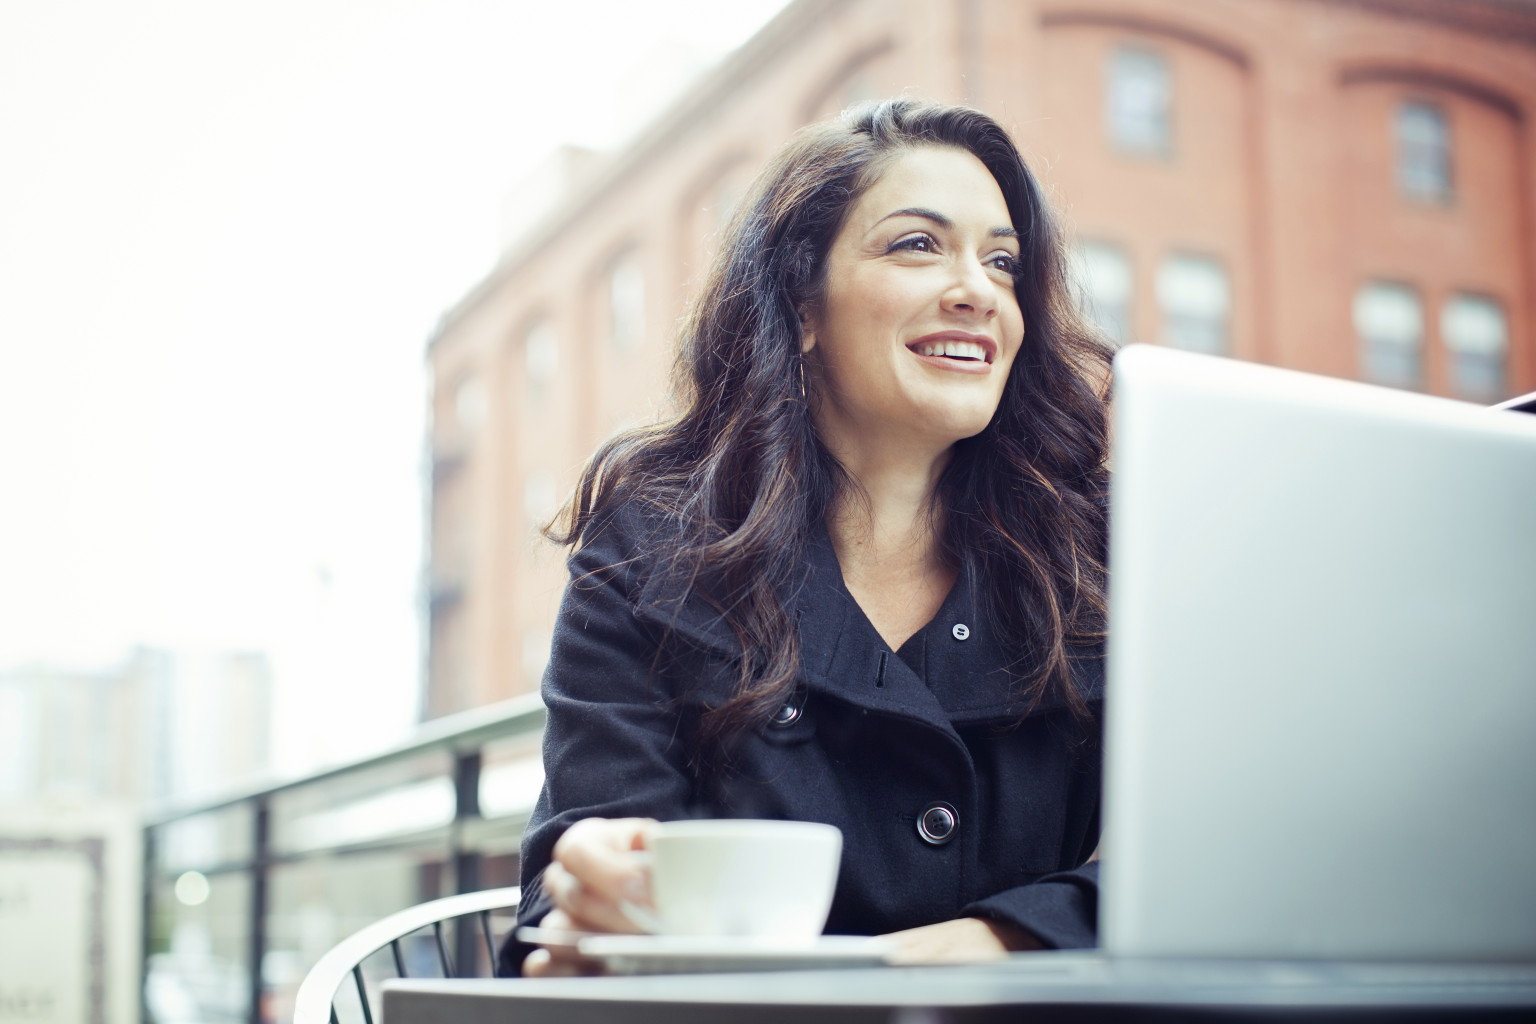 o-career-women-facebook-2fb7501ea9b2b613329bc21aa1336f75.jpg